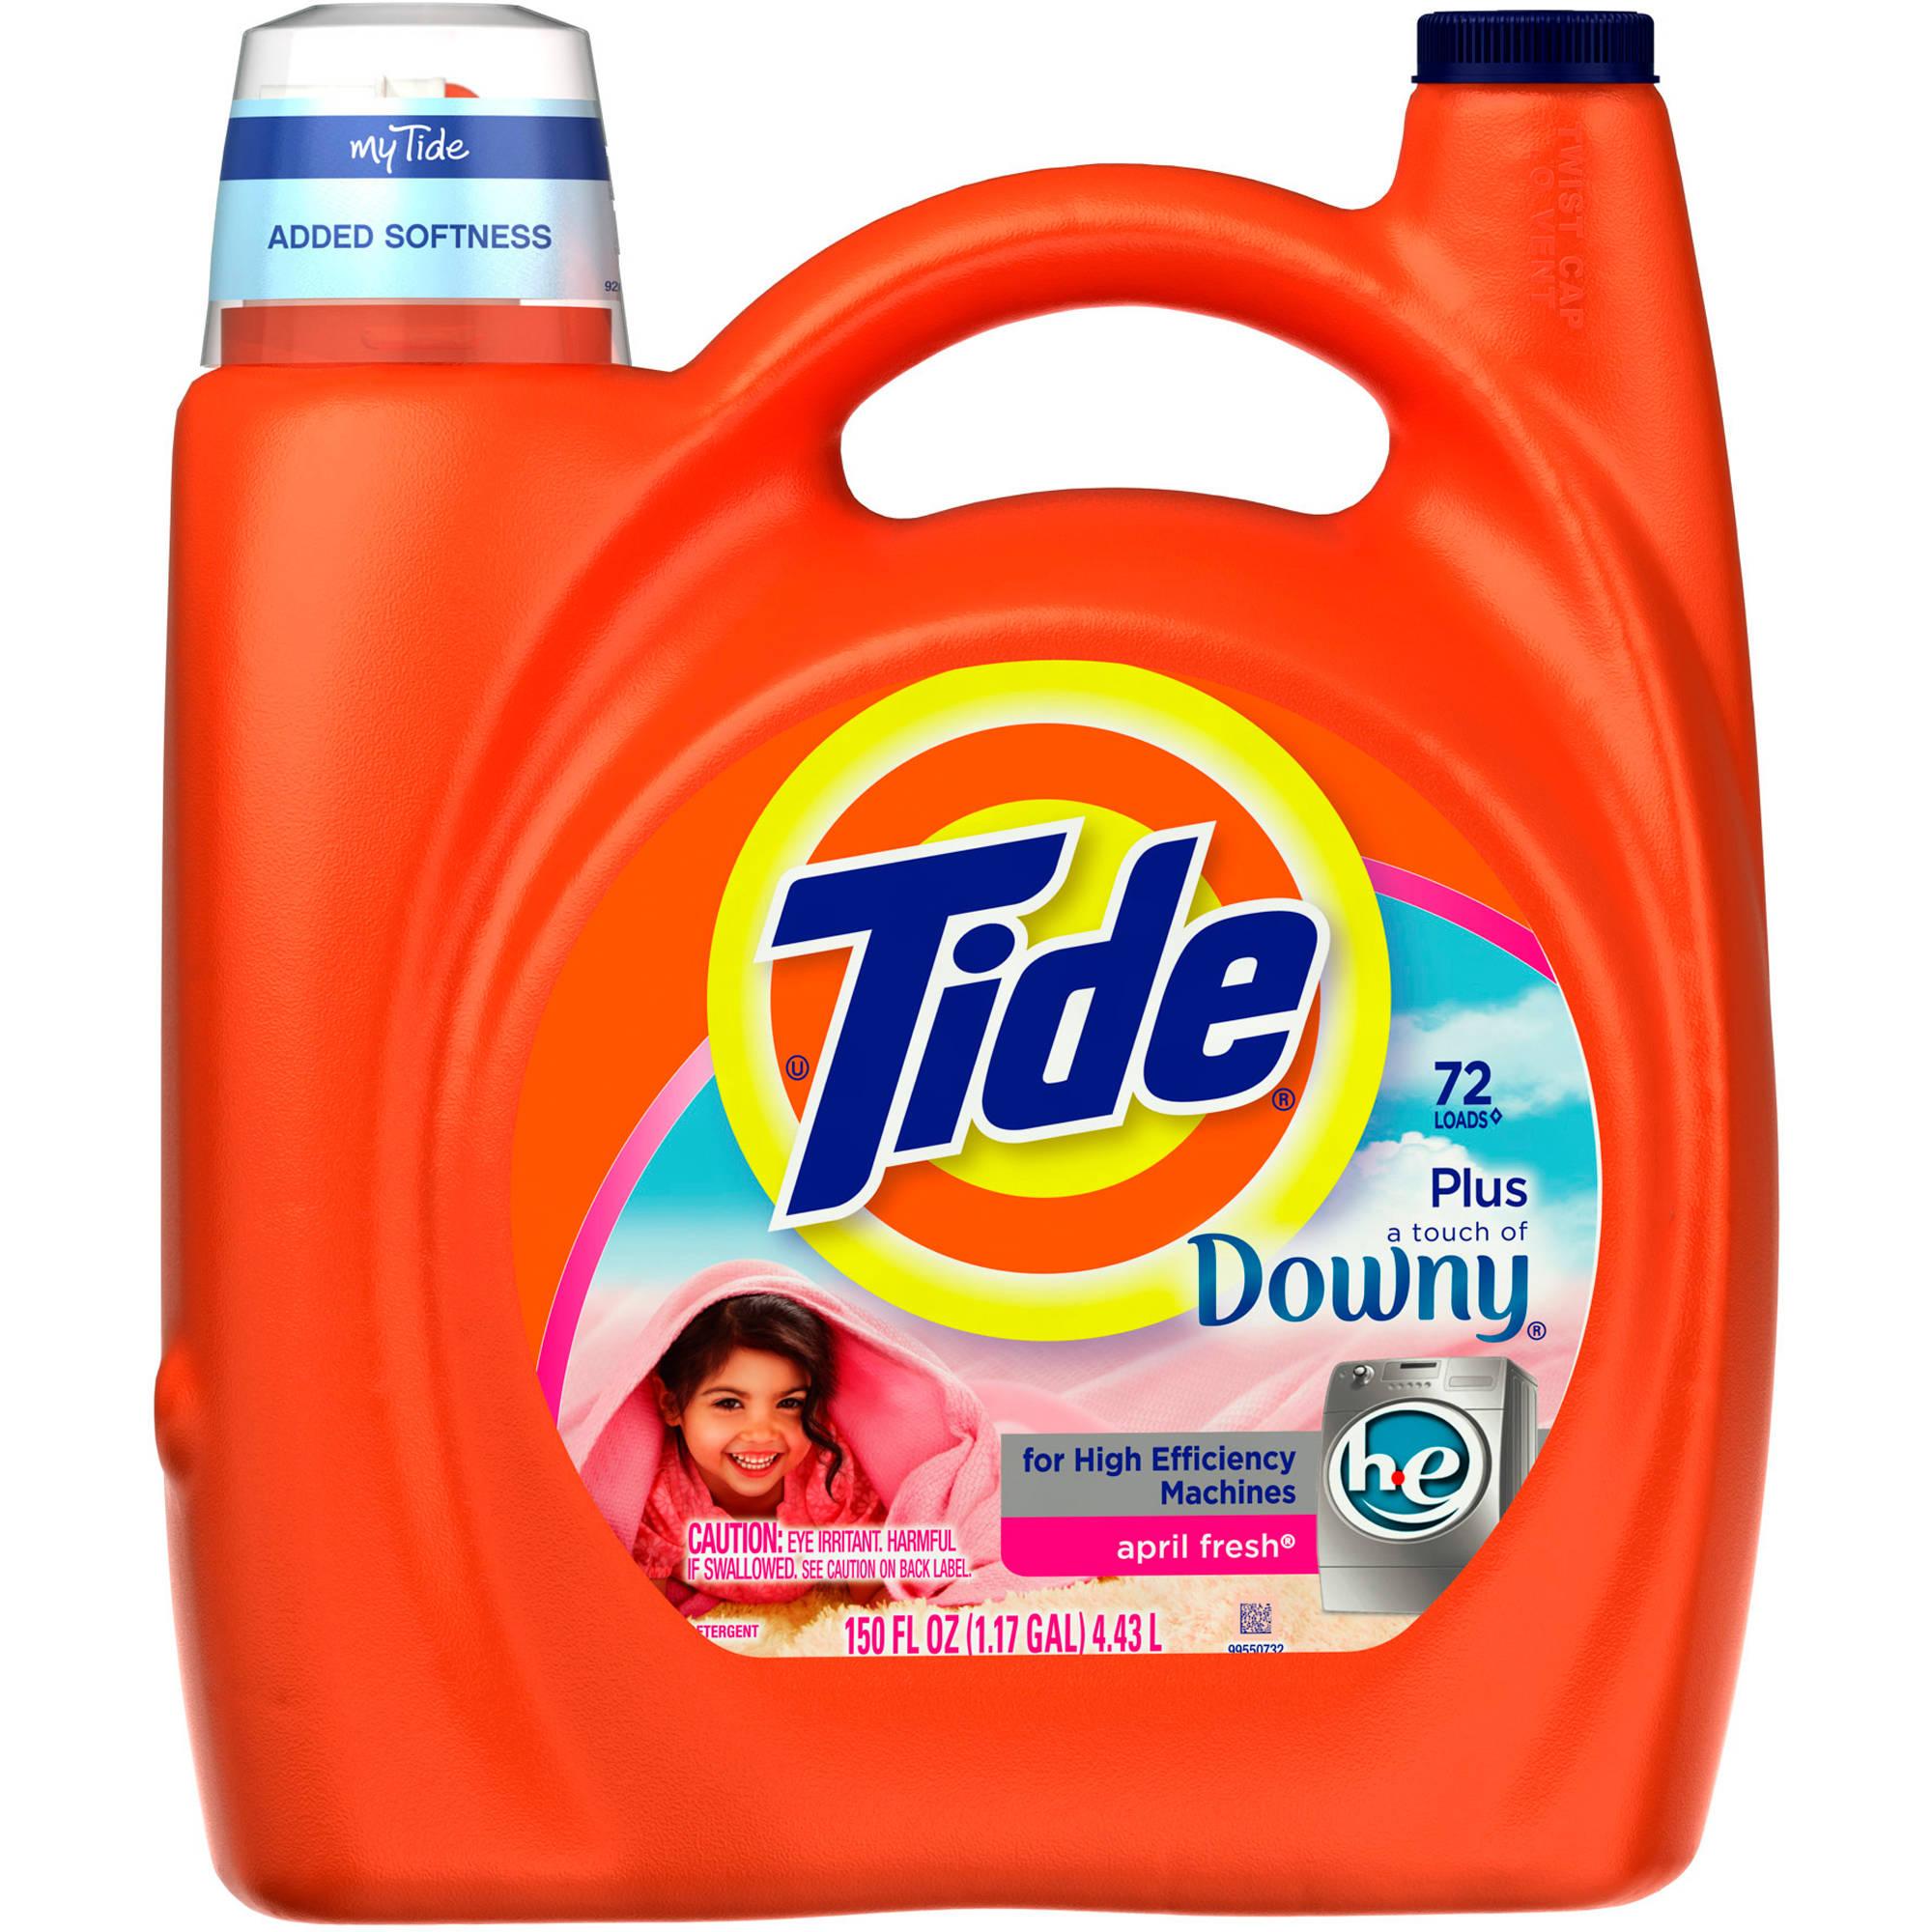 Tide Plus a Touch of Downy April Fresh Scent High Efficiency Liquid Laundry Detergent, 72 Loads 150 fl oz